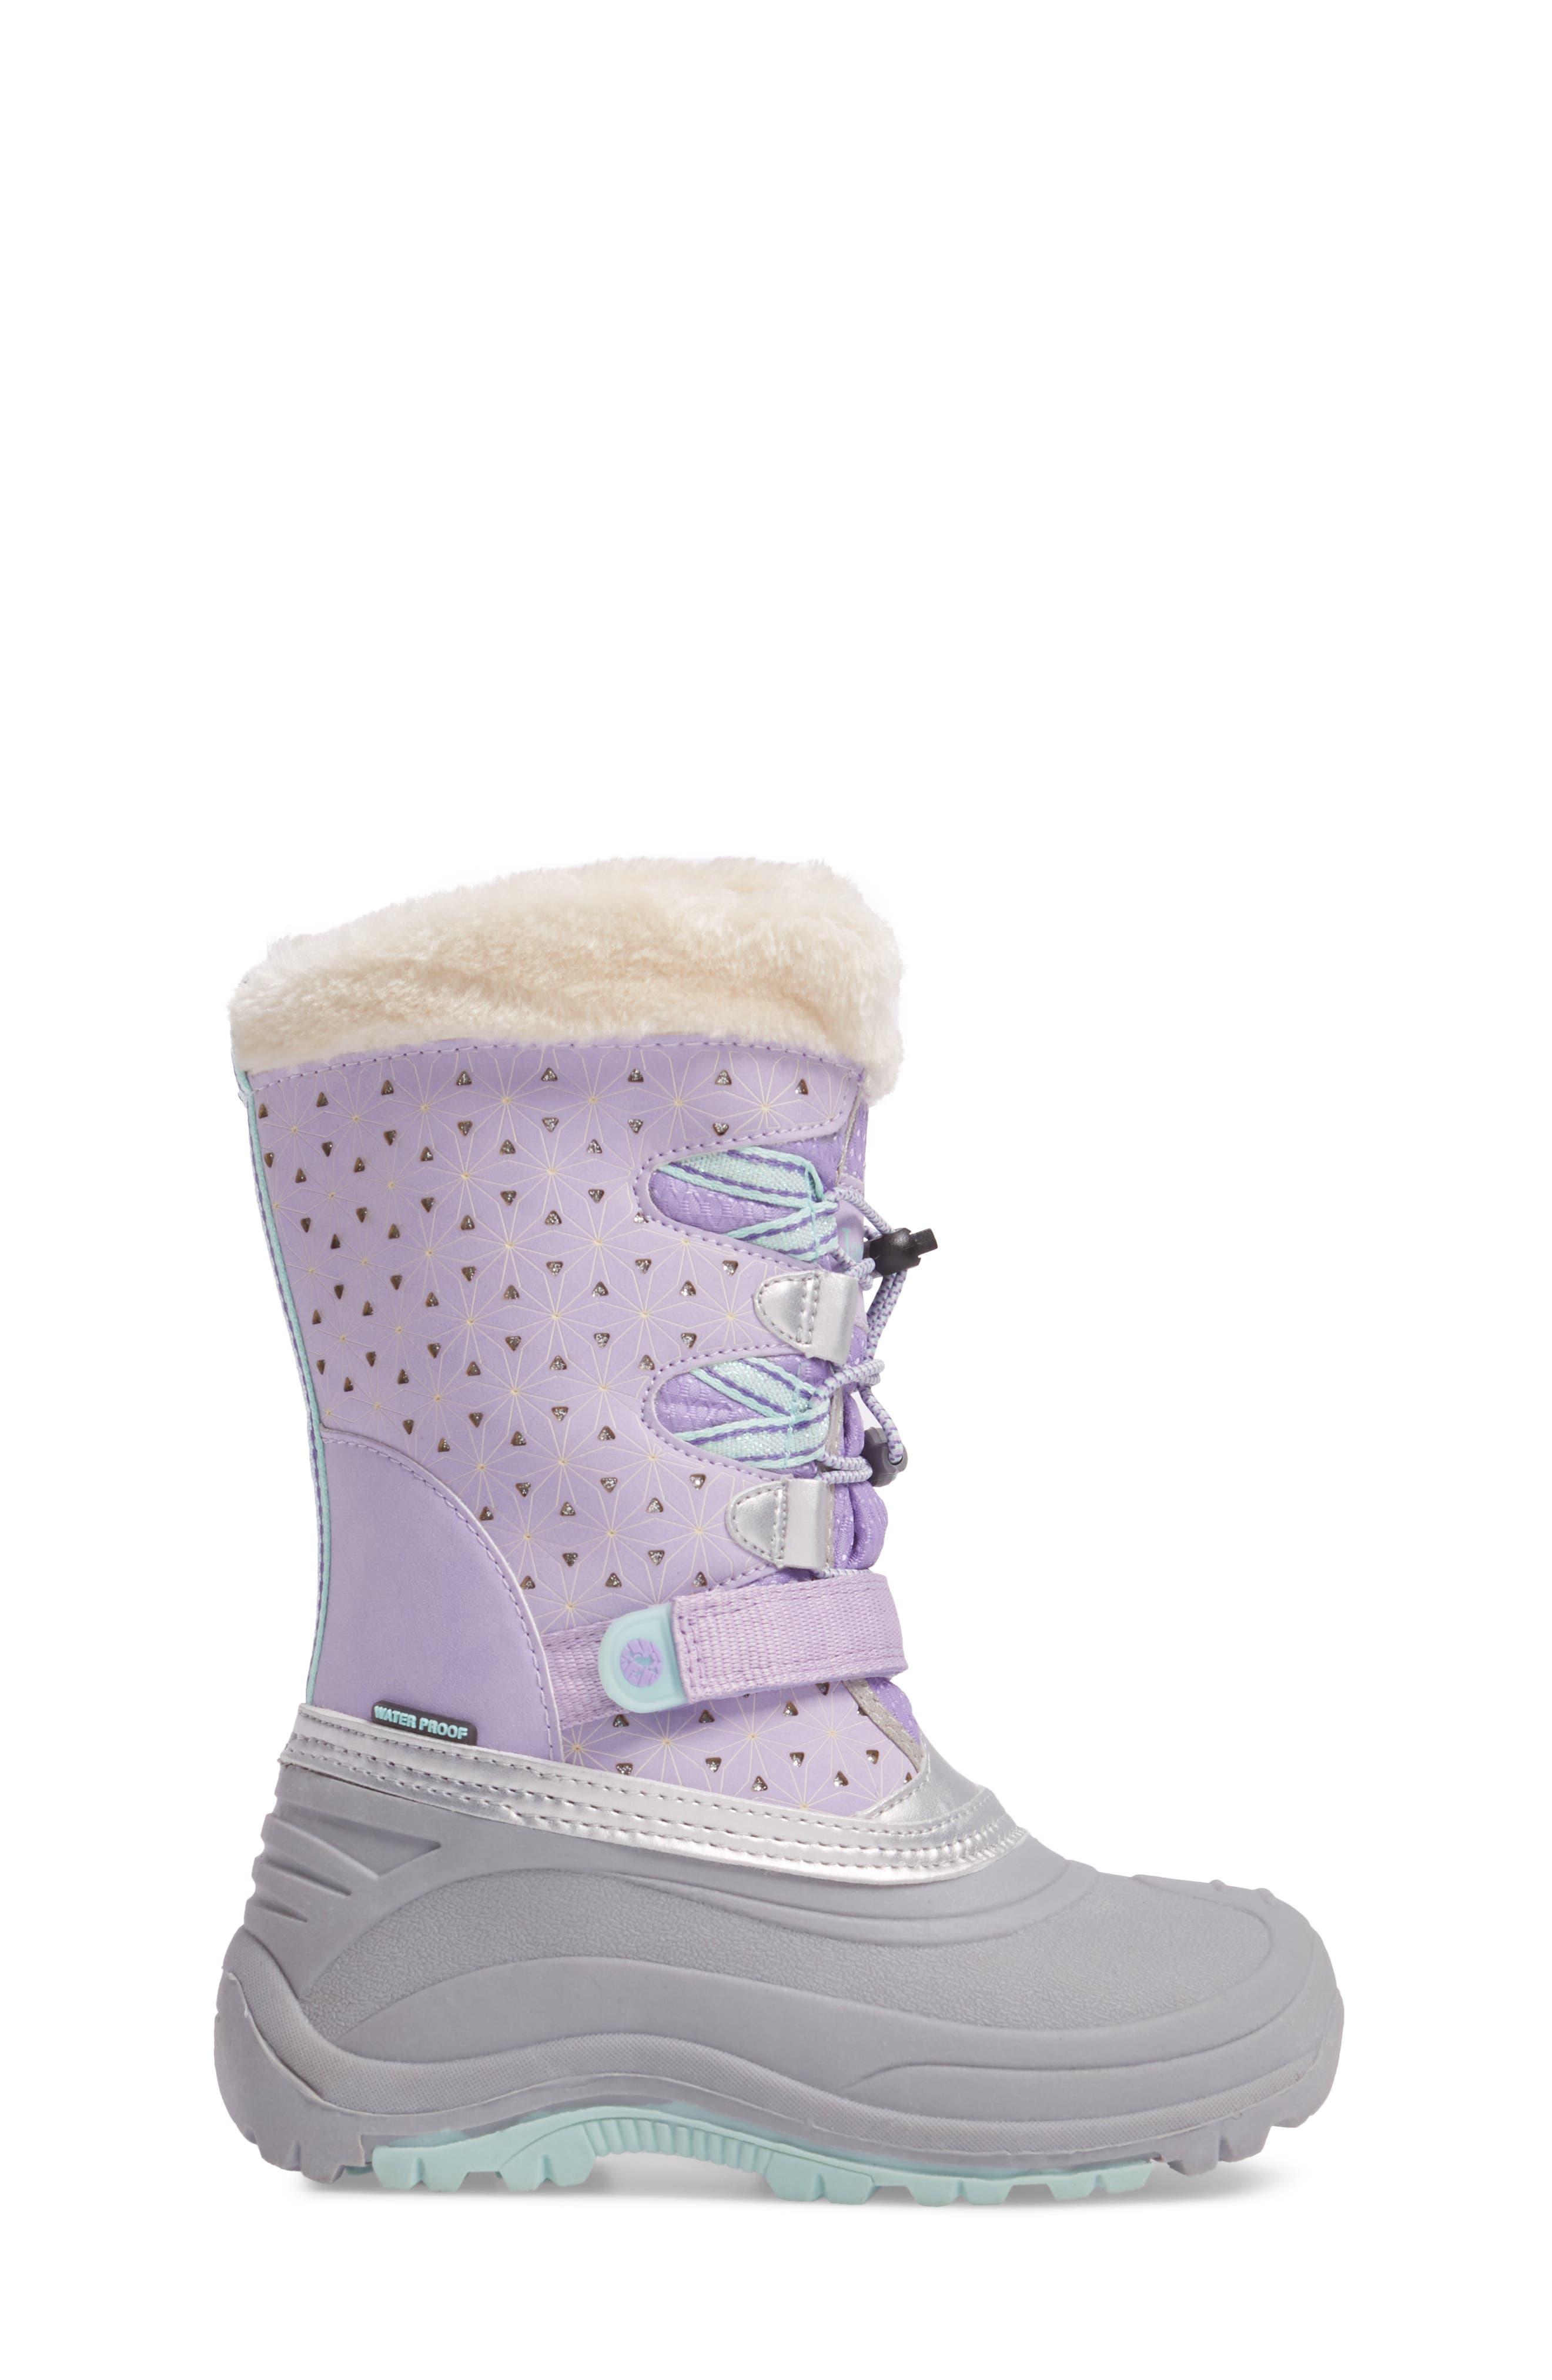 Alternate Image 3  - Jambu 'Venom' Waterproof Insulated Snow Boot (Toddler, Little Kid & Big Kid)